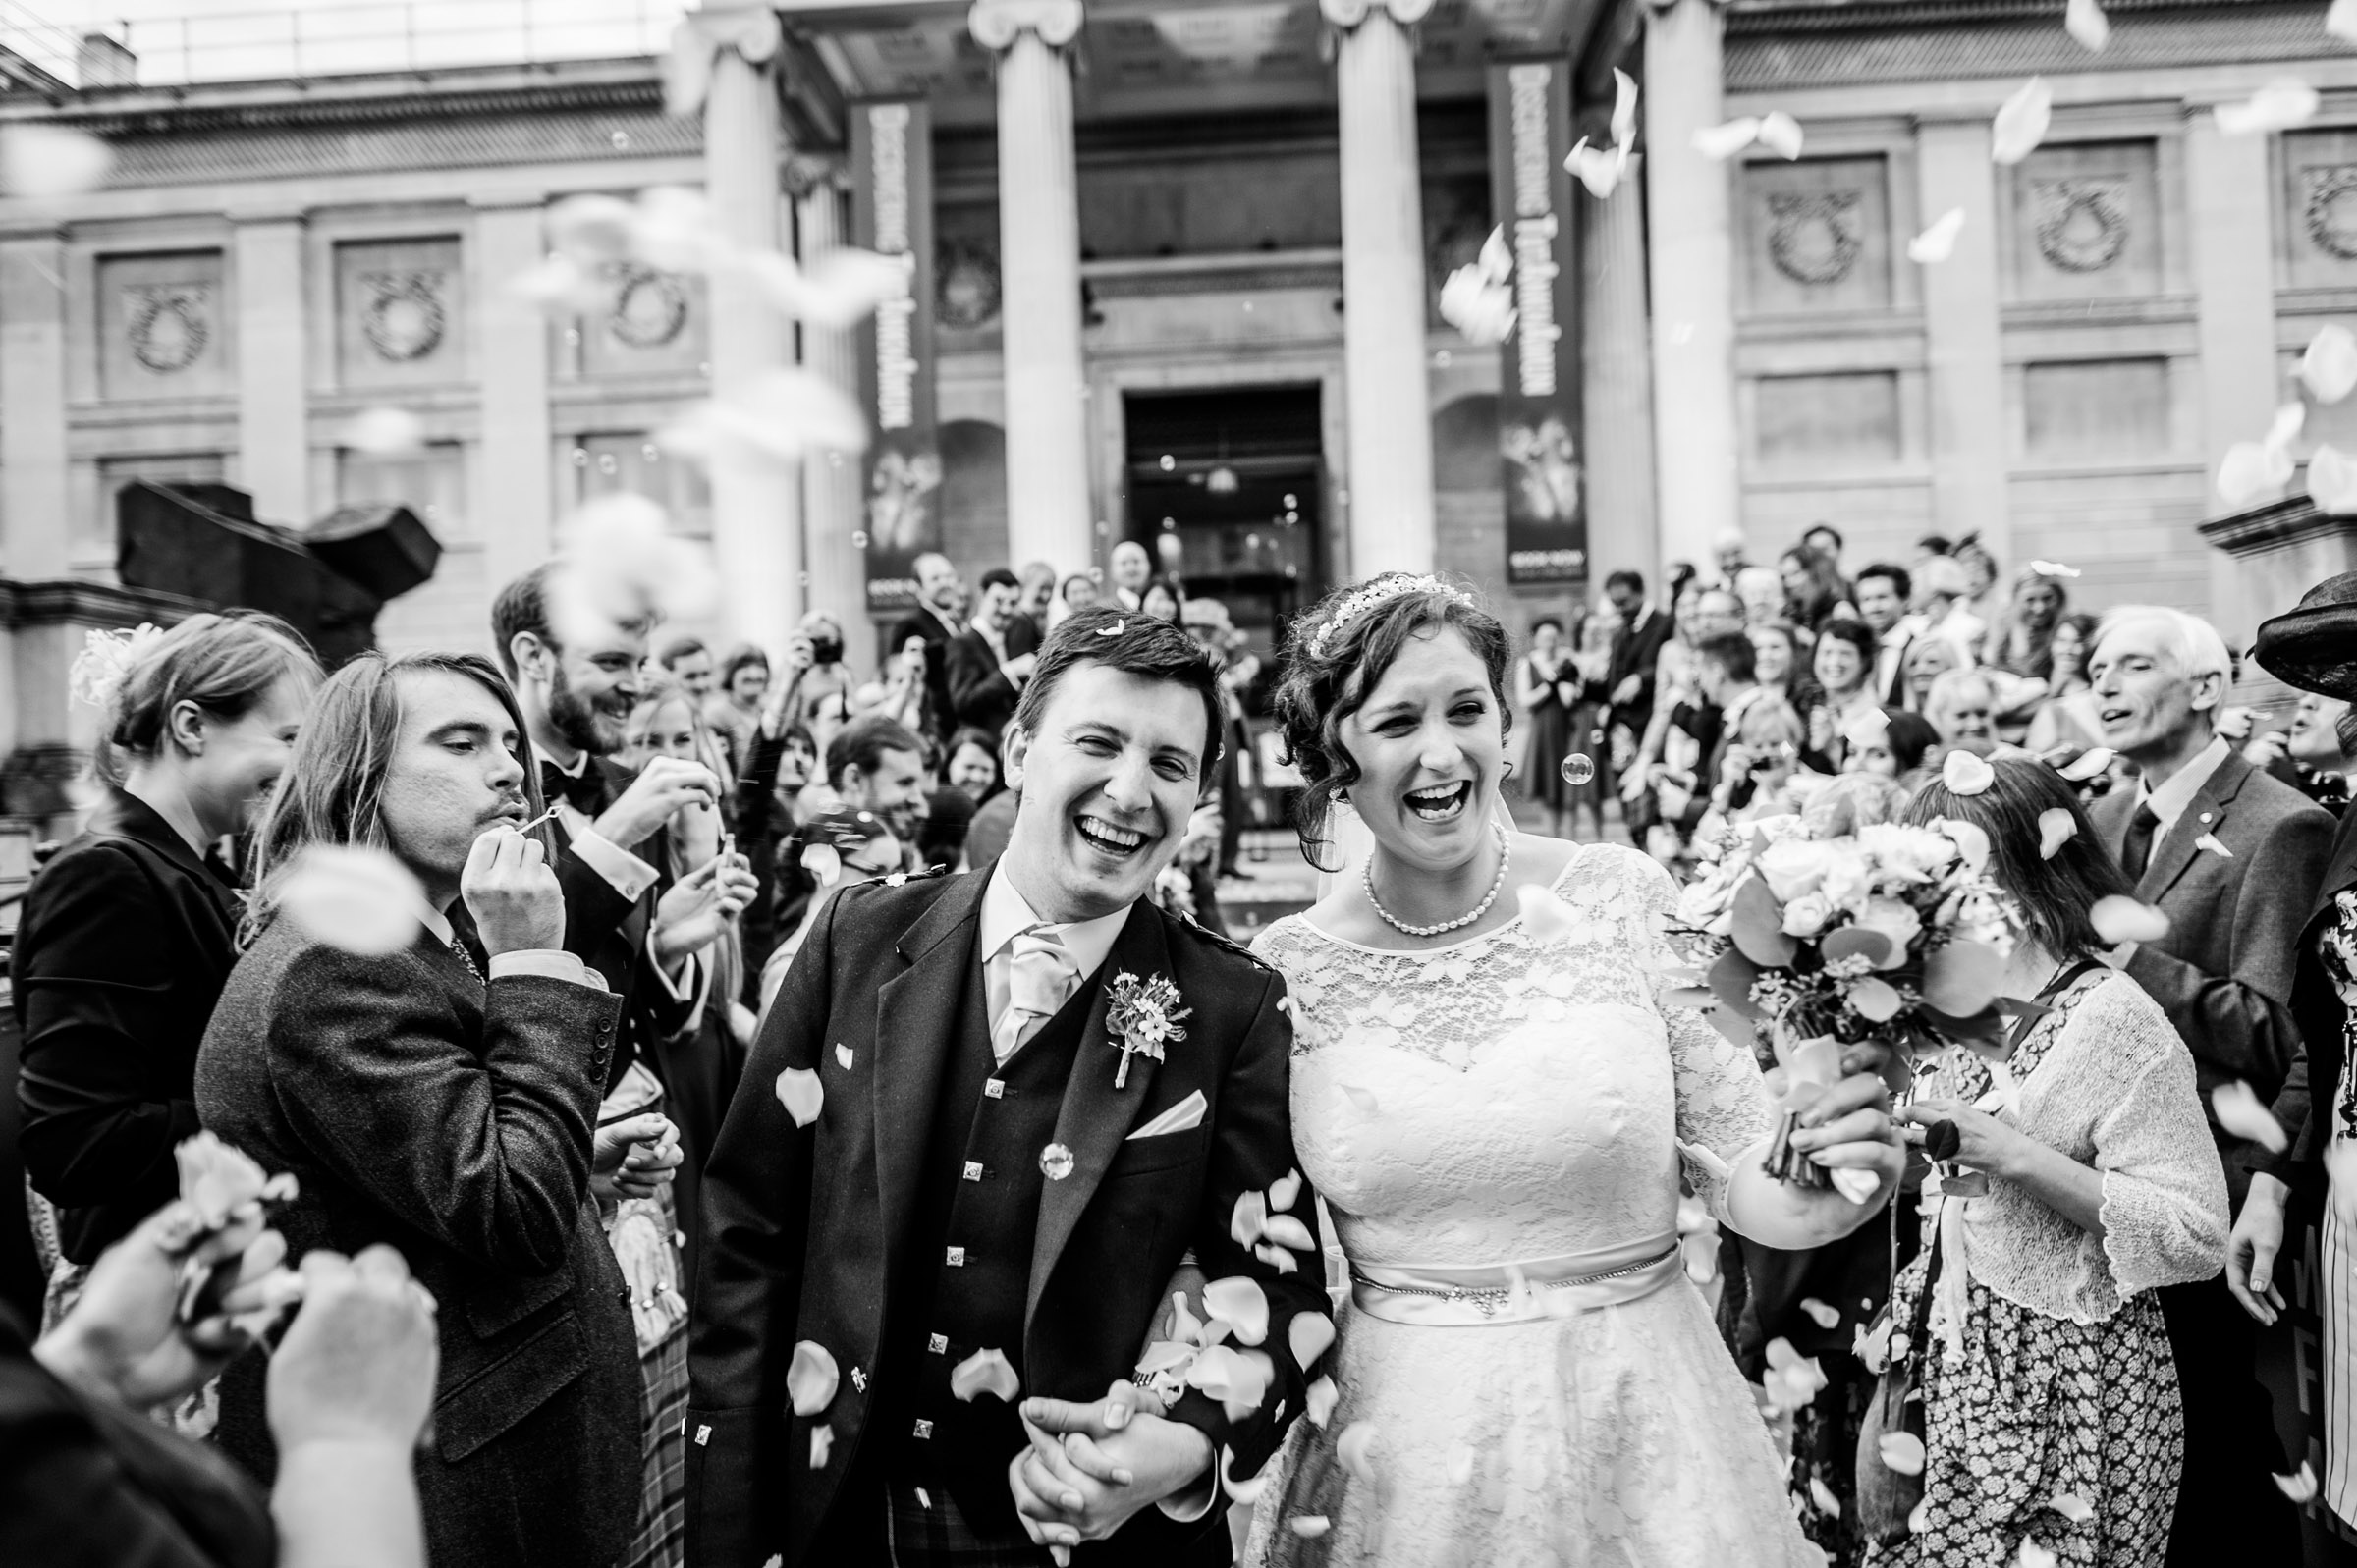 Ashmolean-Museum-Wedding-Pictures-0046.jpg